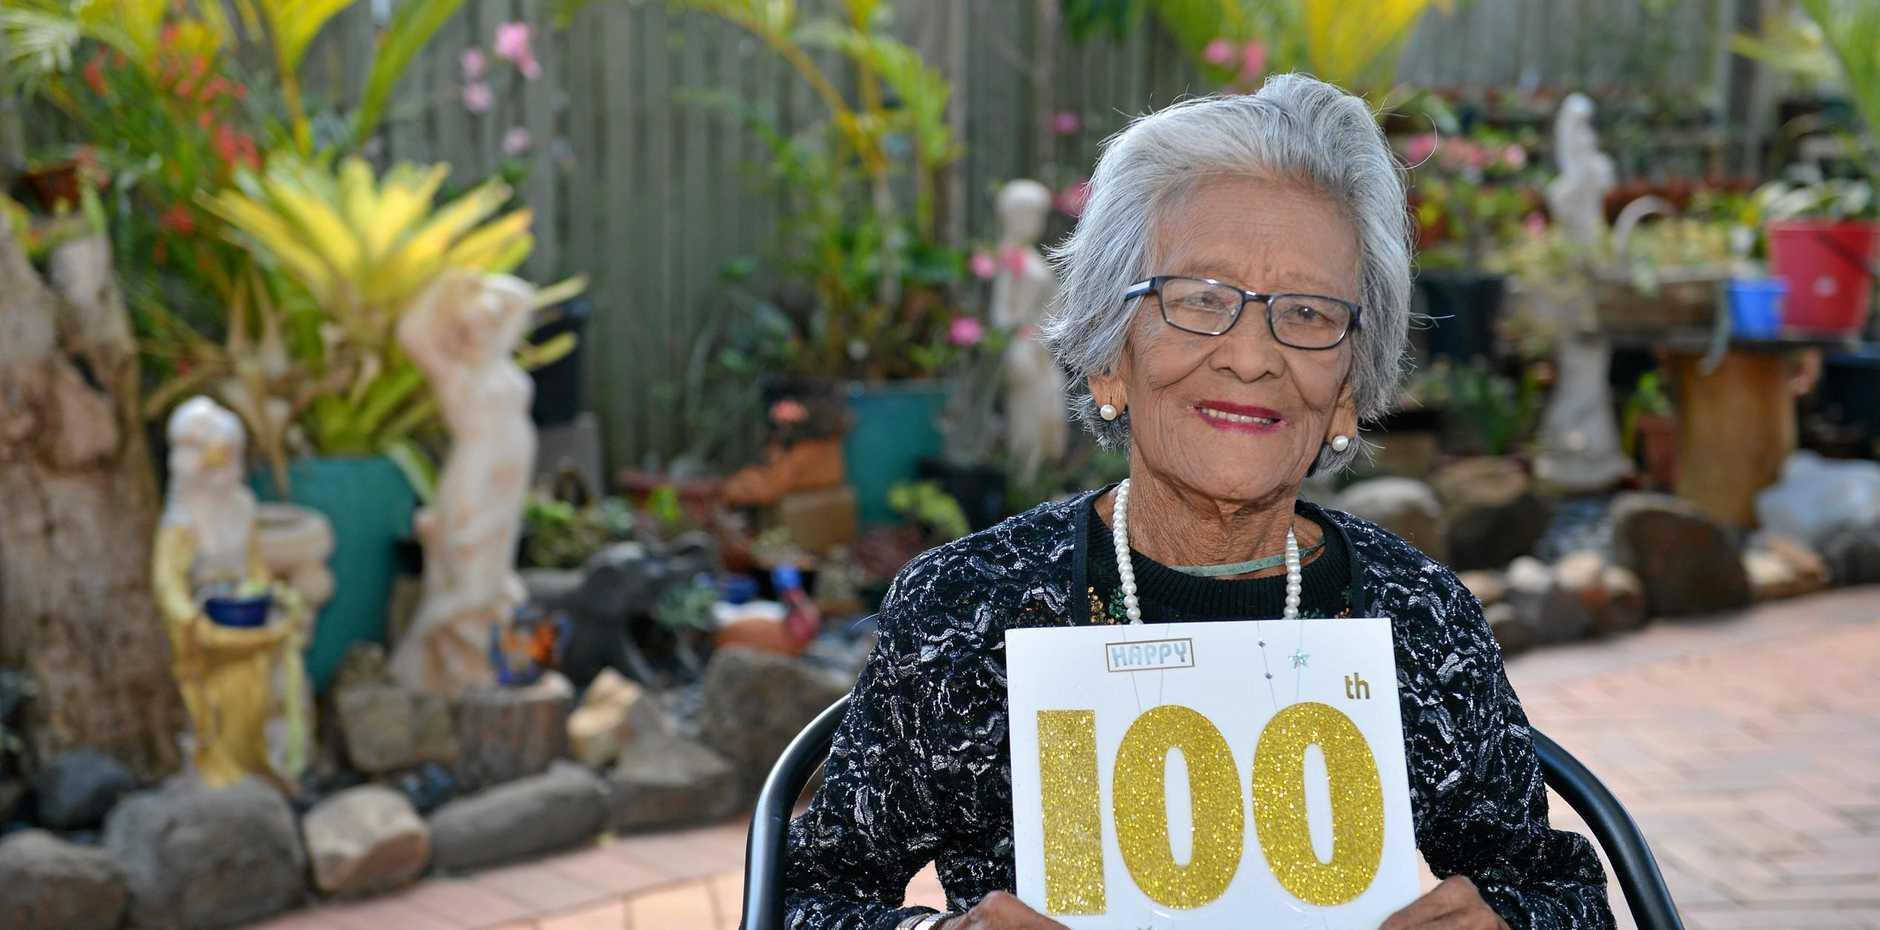 HAPPY BIRTHDAY: Adela Durque celebrates her 100th birthday.